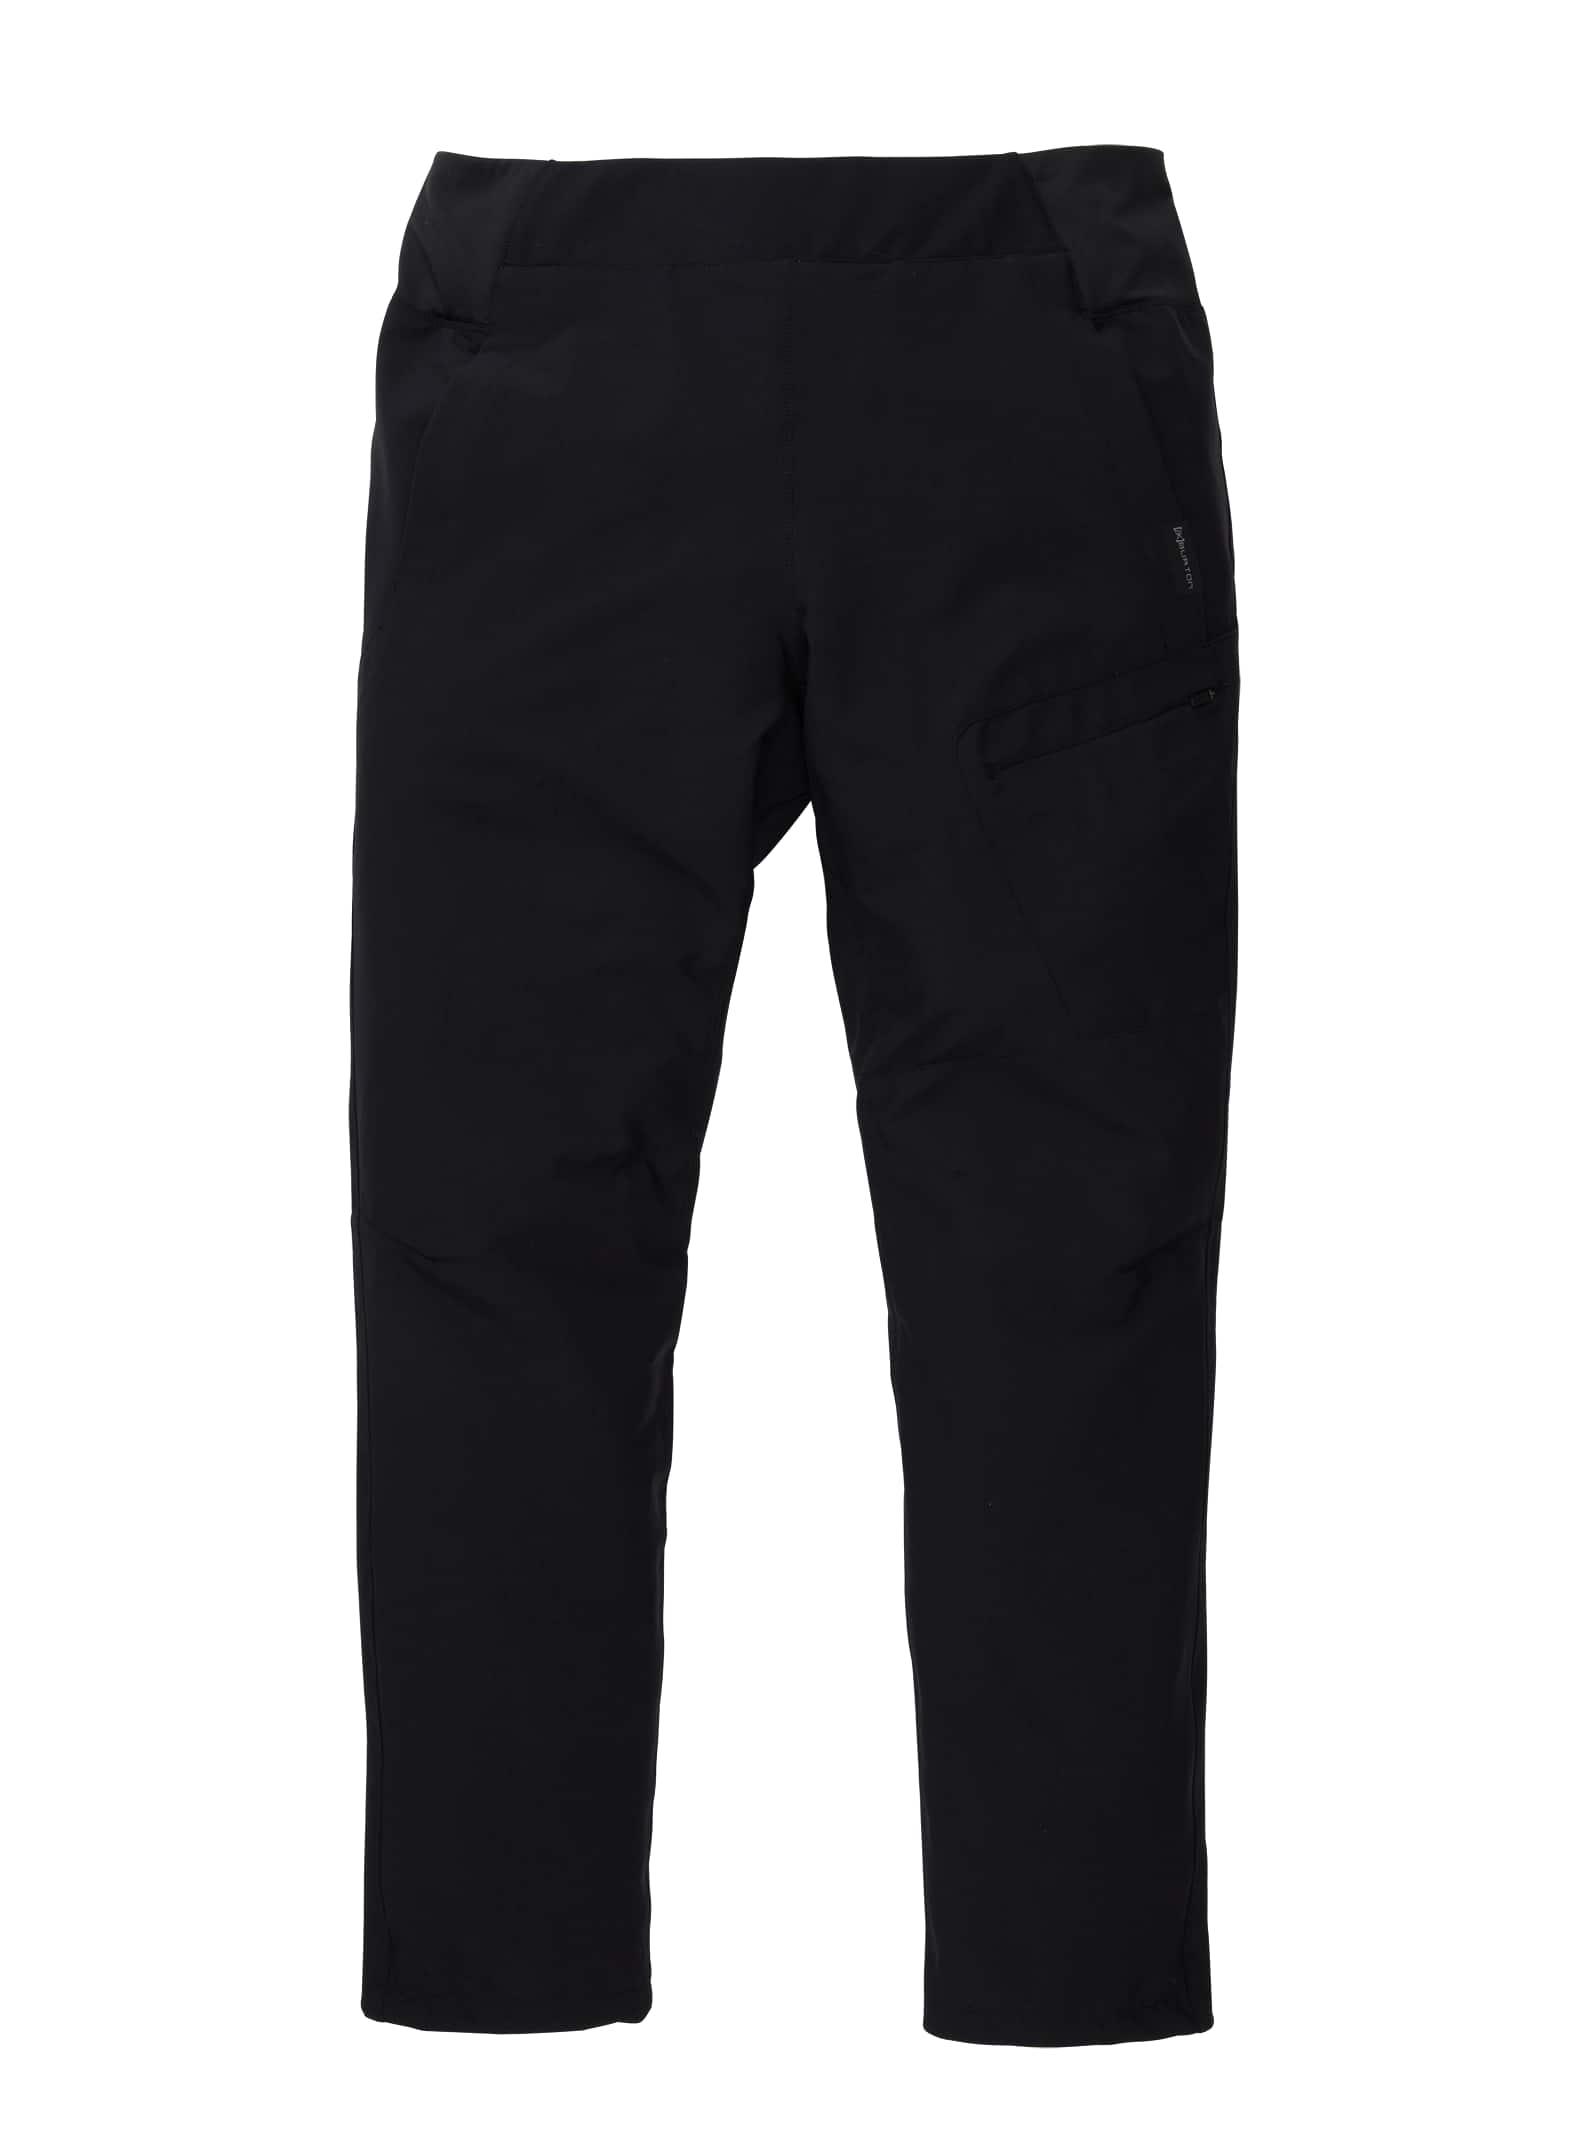 Burton [ak] Airpin-byxor för damer, XS